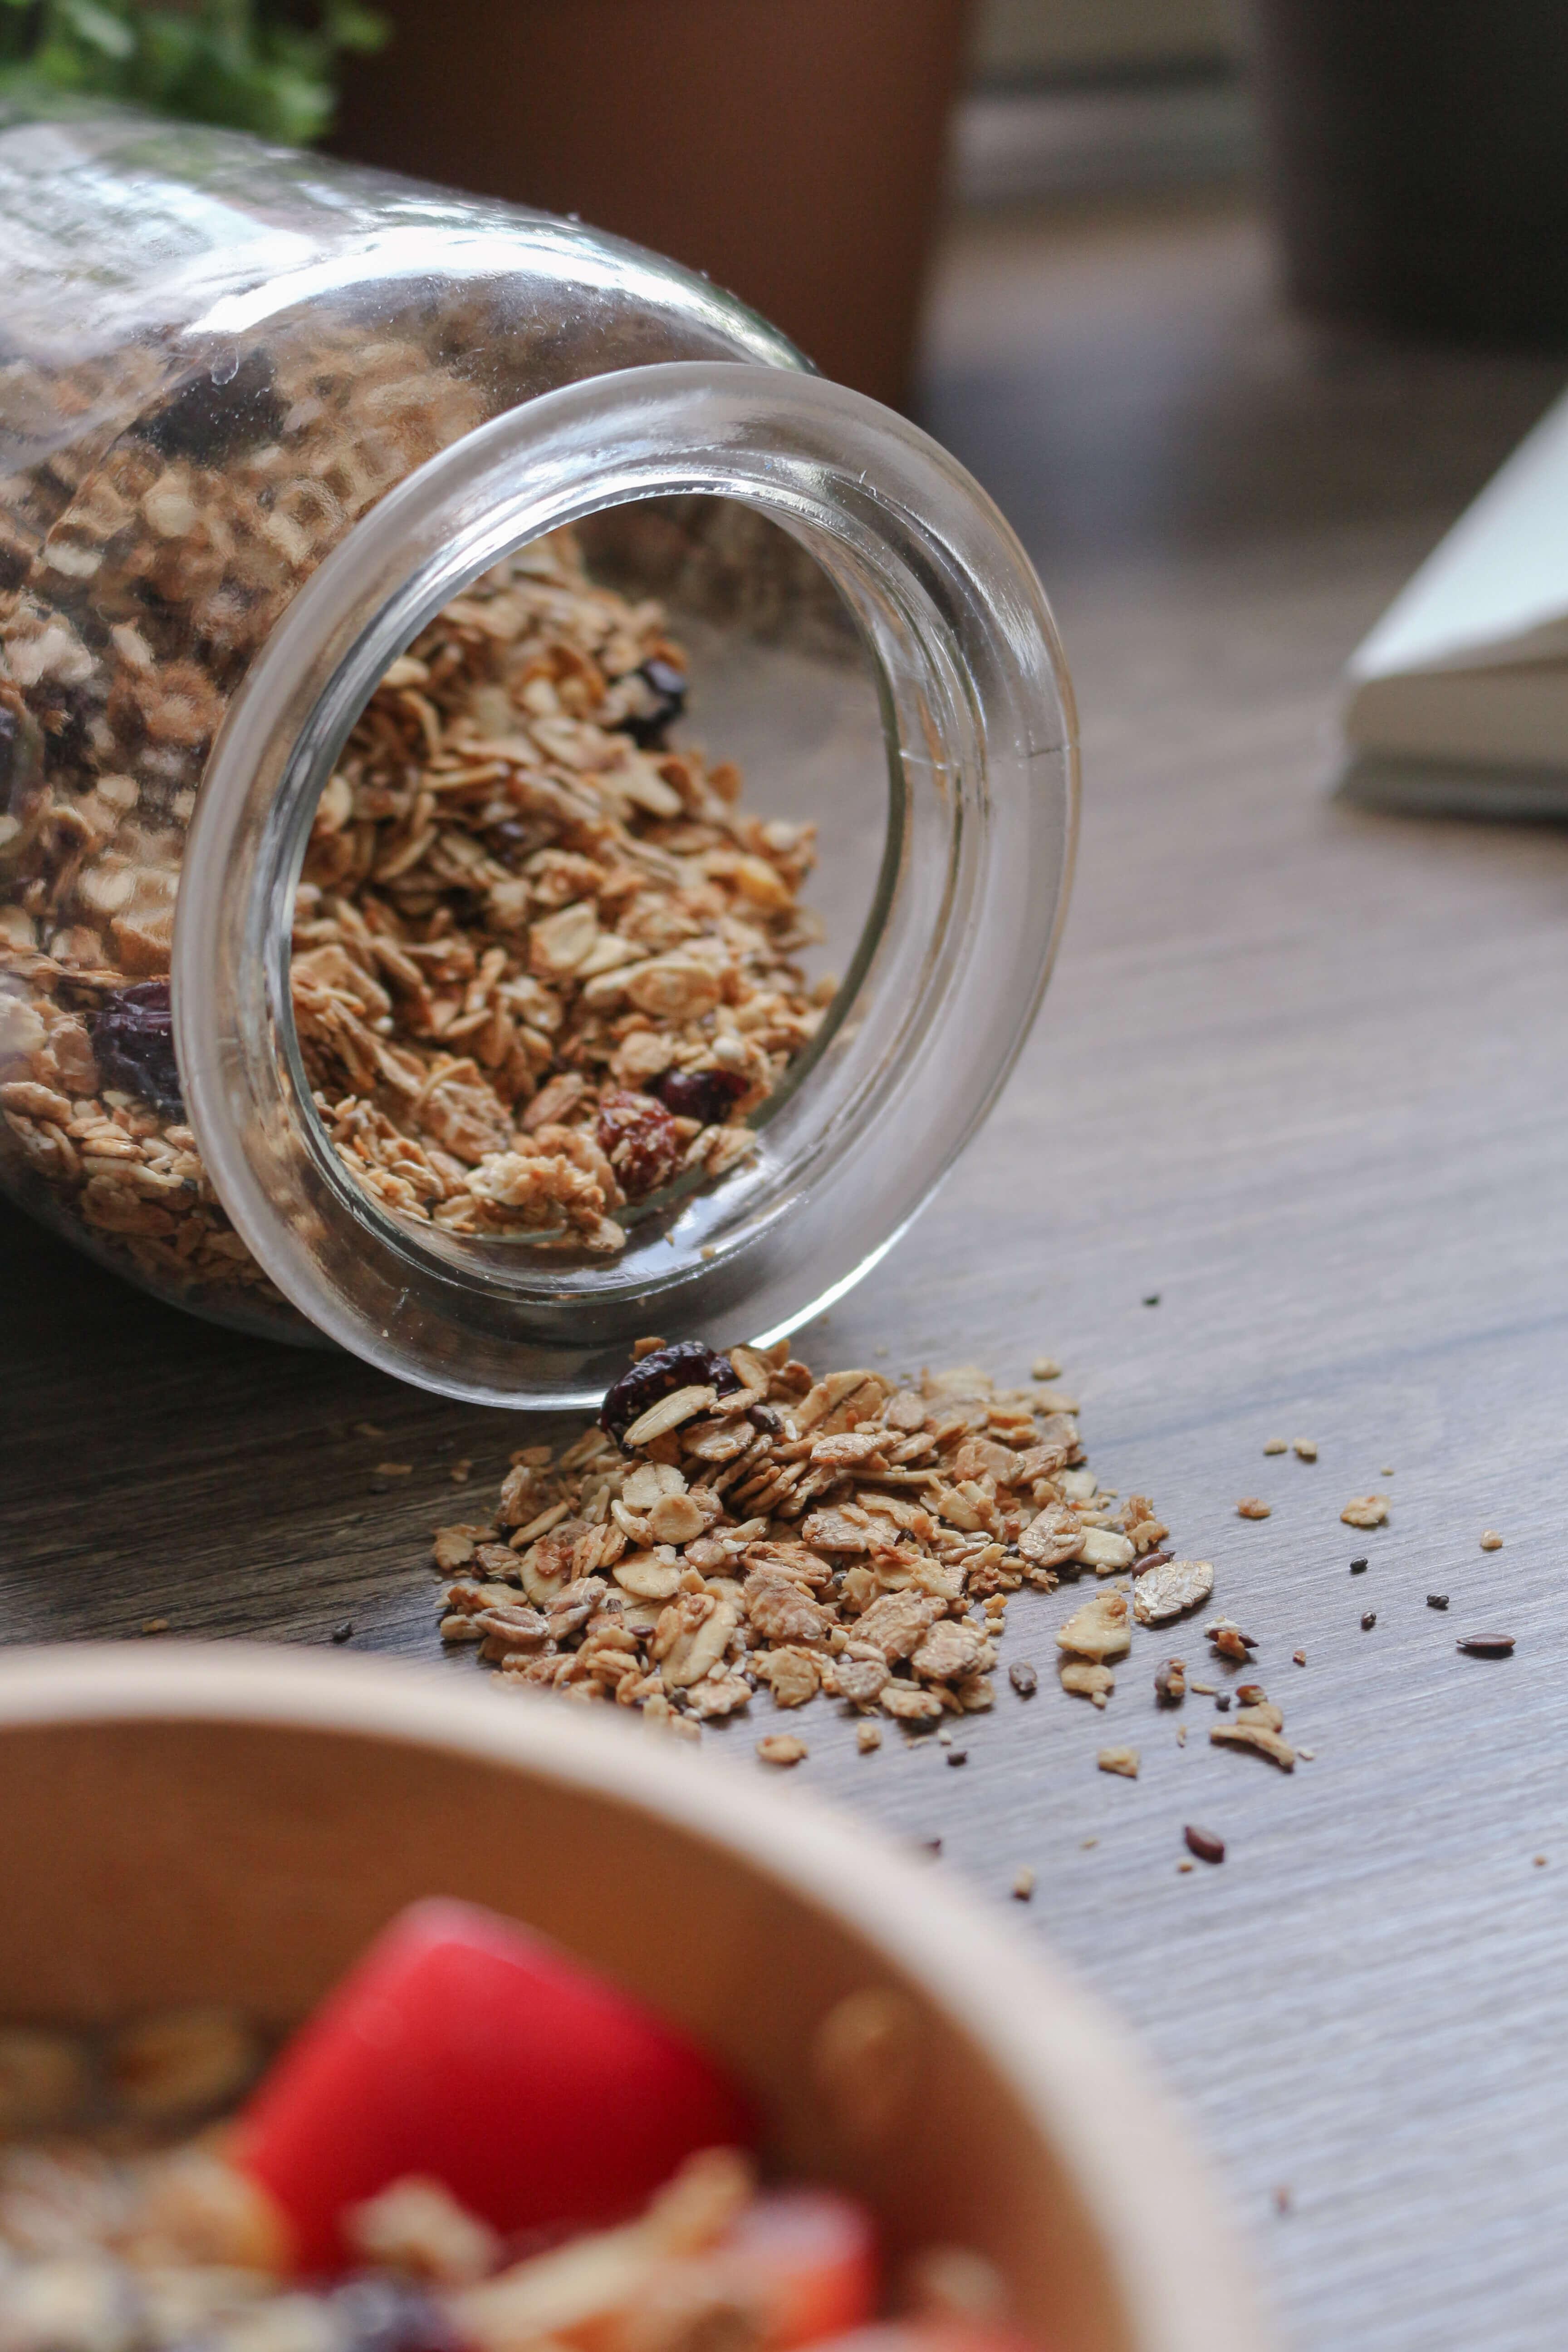 Rezept für veganes Cranberry-Knusper Müsli